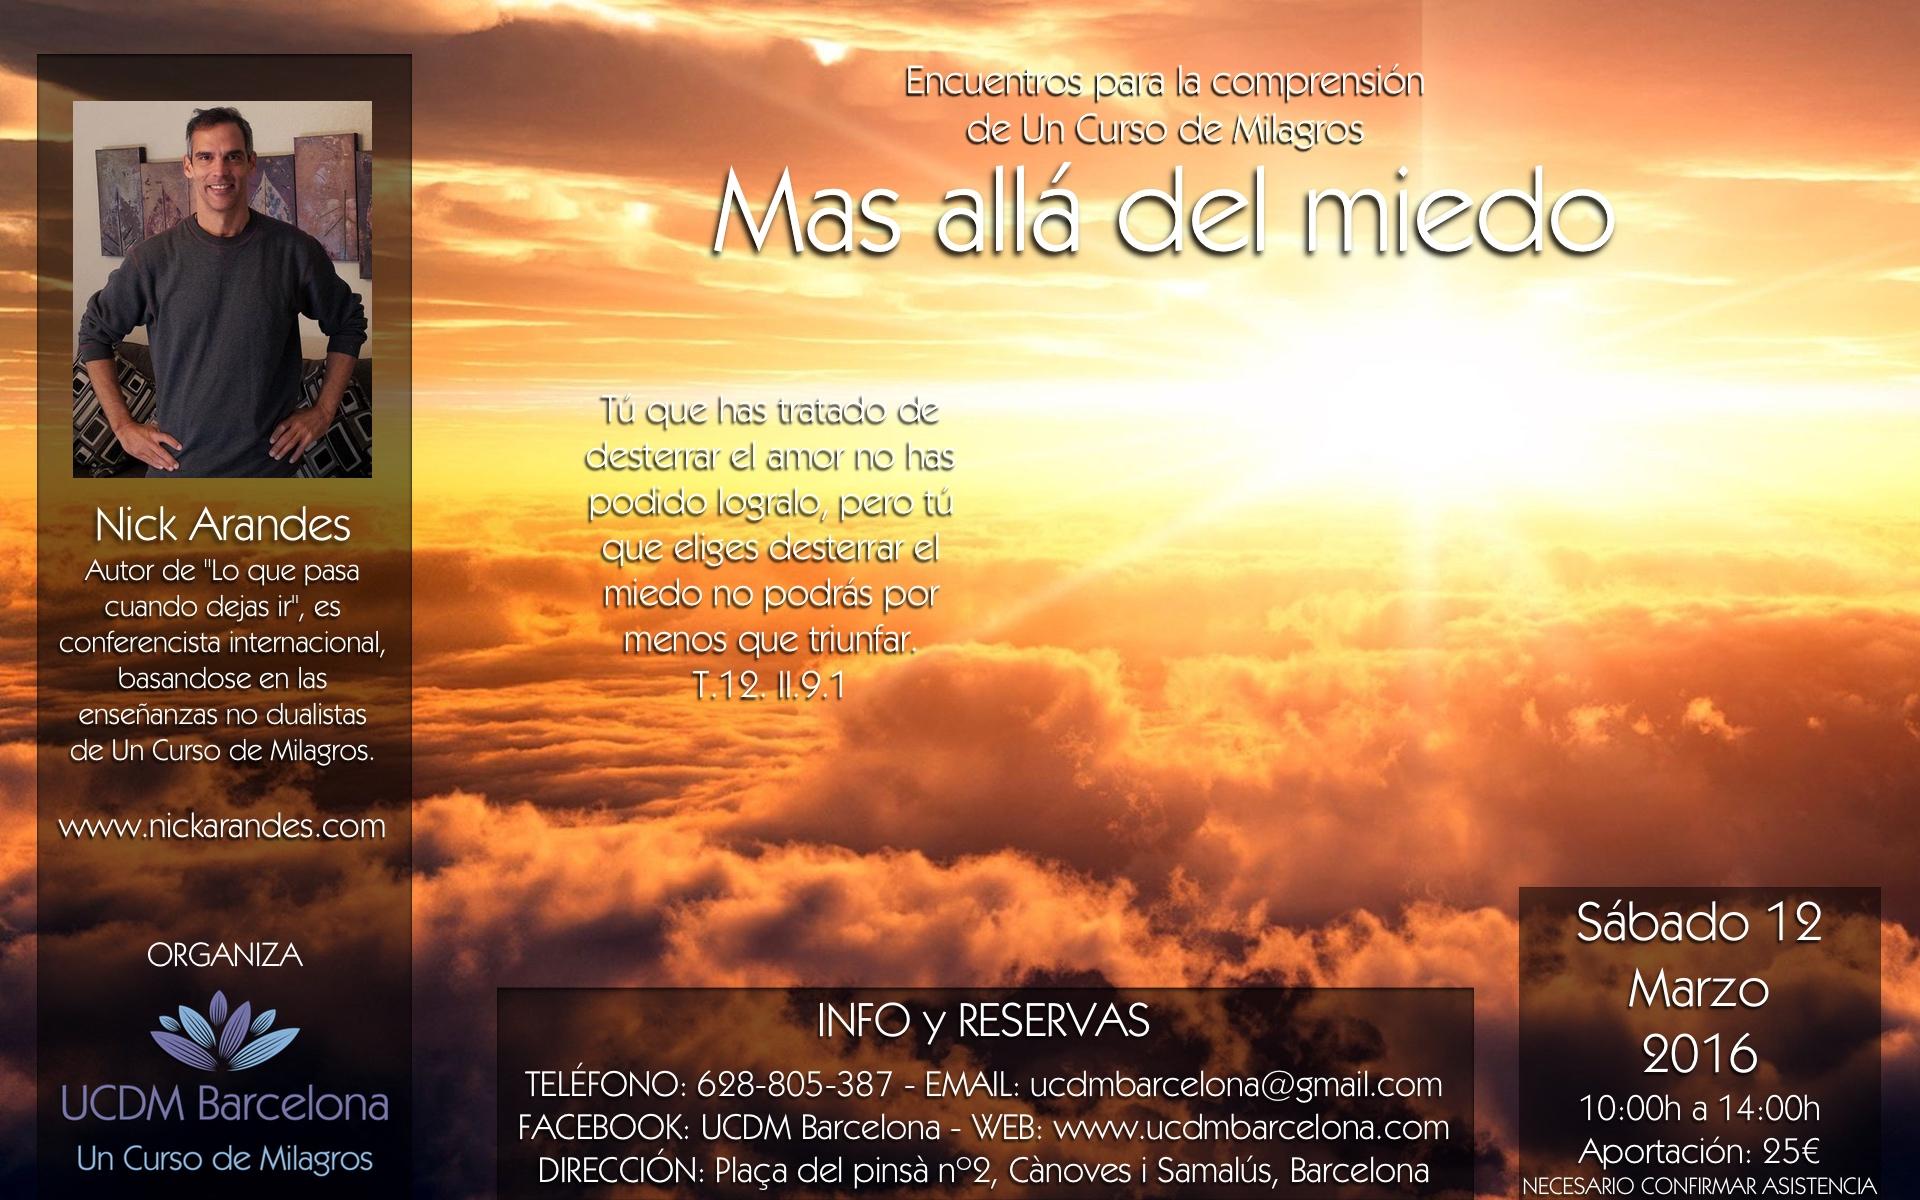 Un Curso de Milagros Nick Arandes en Marzo UCDM Barcelona (Cànoves i Samalús)